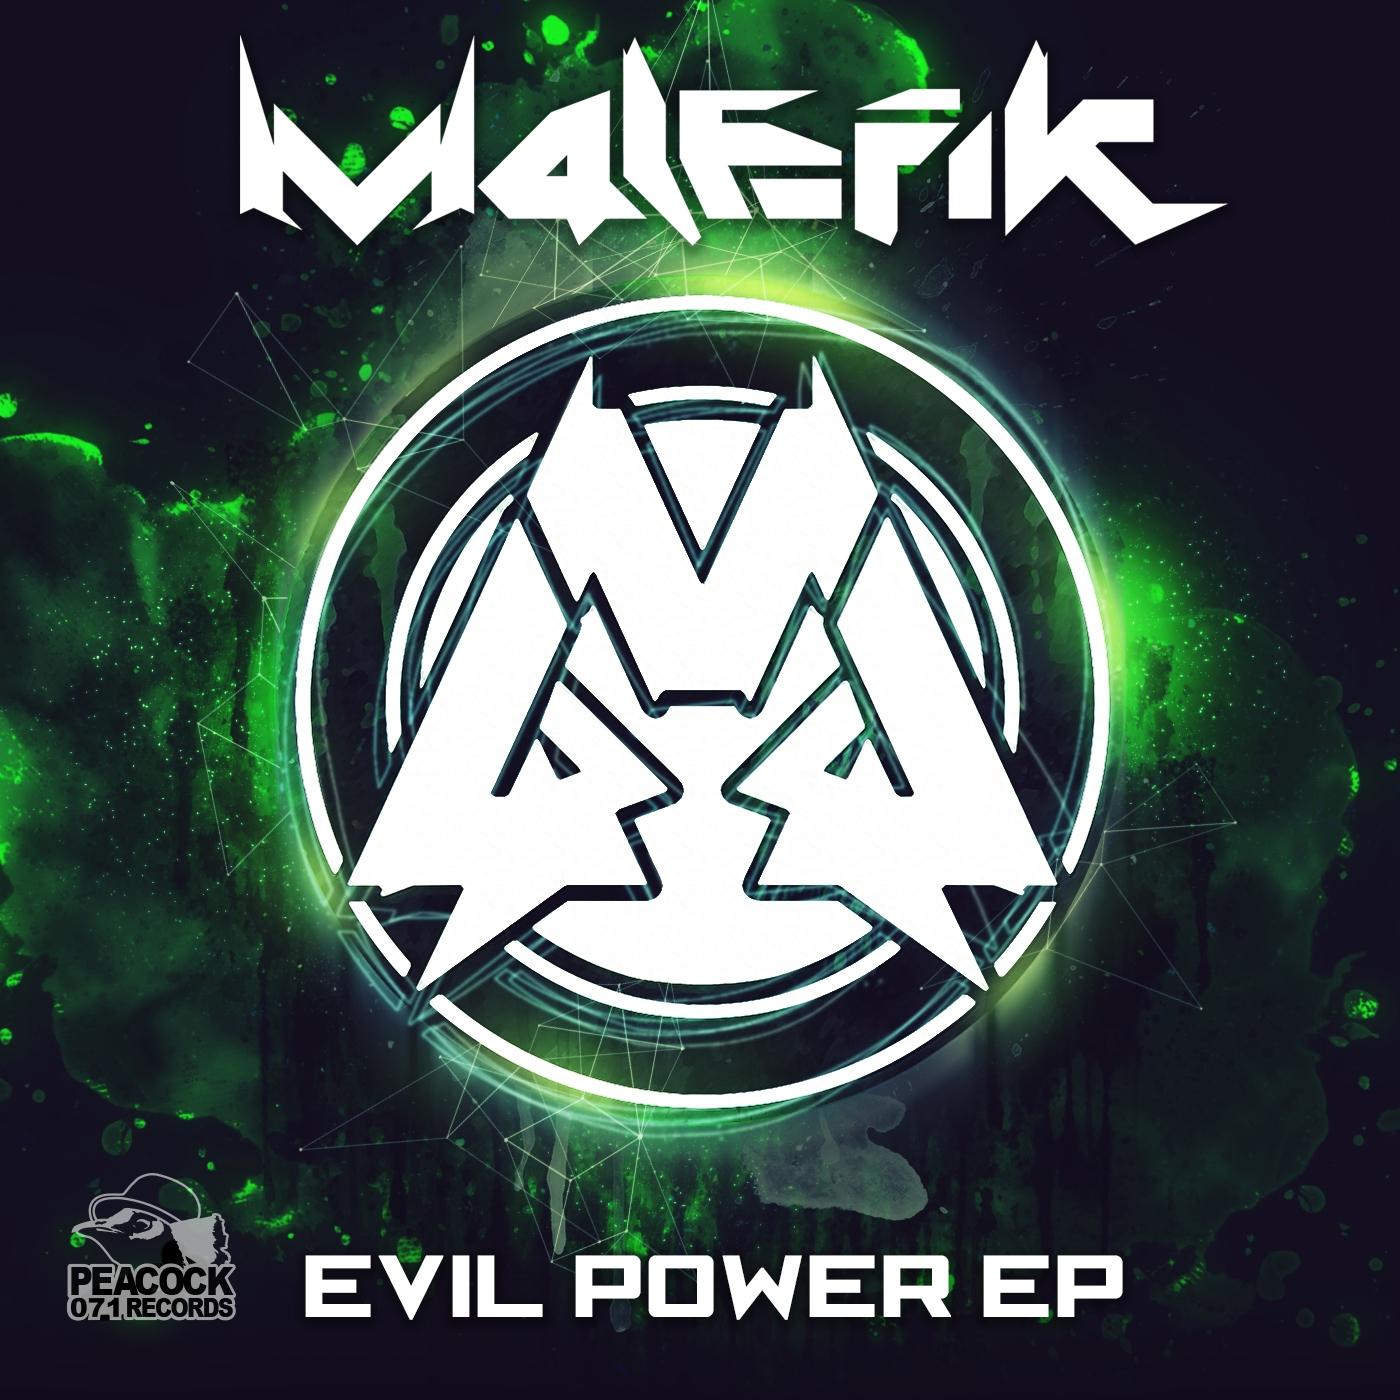 Rise To Power Monstrosity: Rise Of The Forgotten (M4lefik Remix)